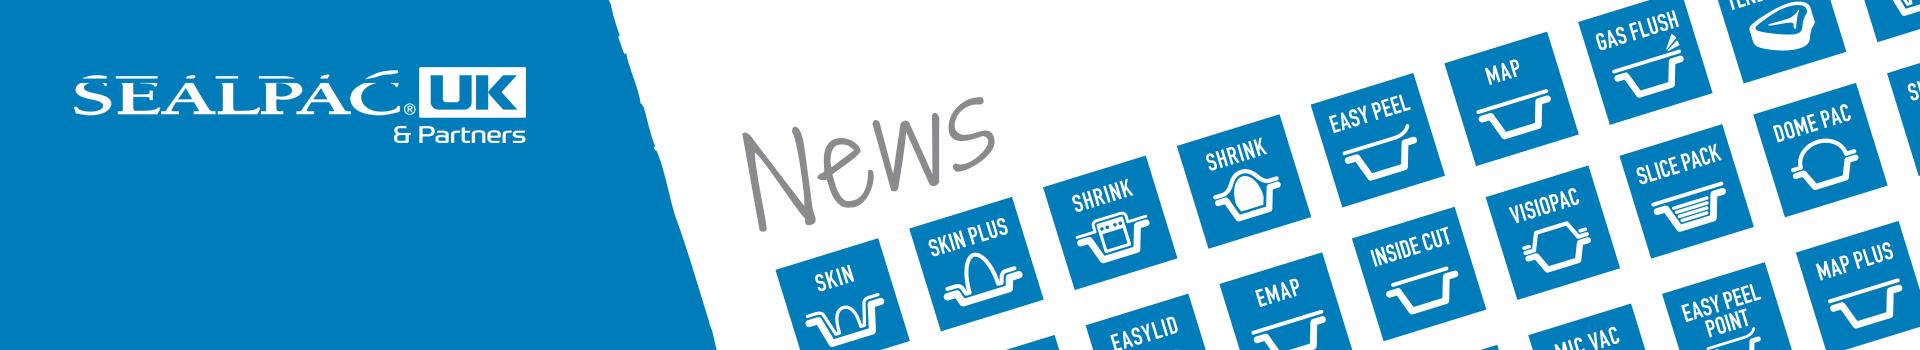 SealPac_ServiceIcons_NewsPageBanner